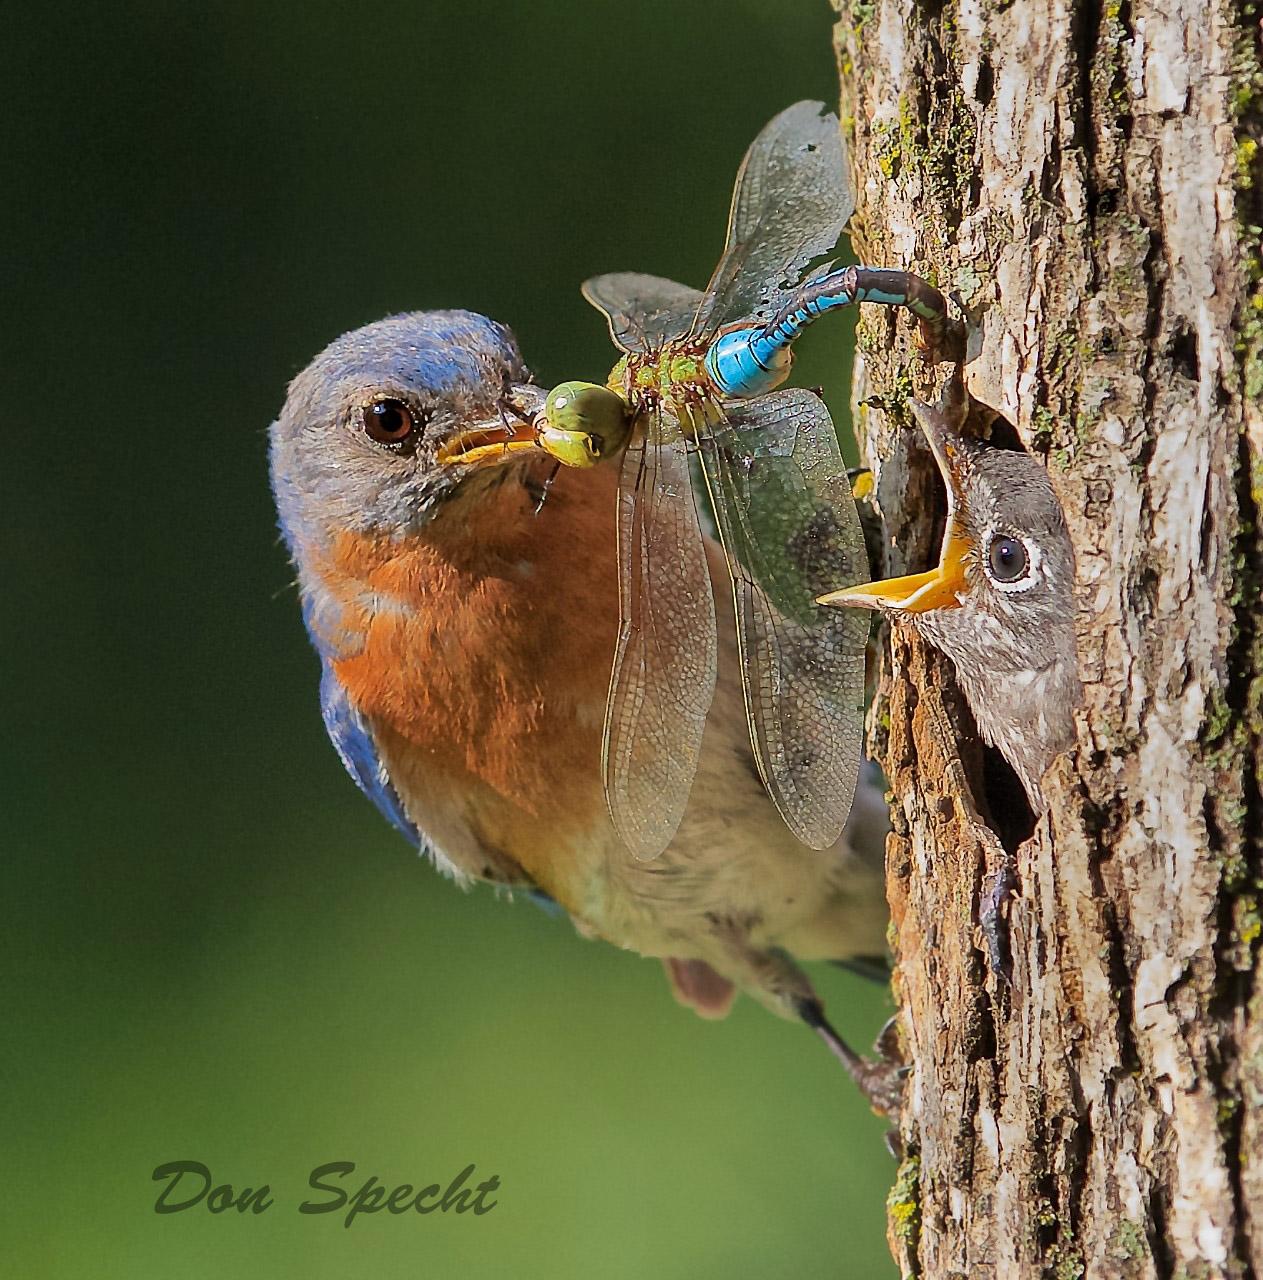 Eastern bluebird and nestling